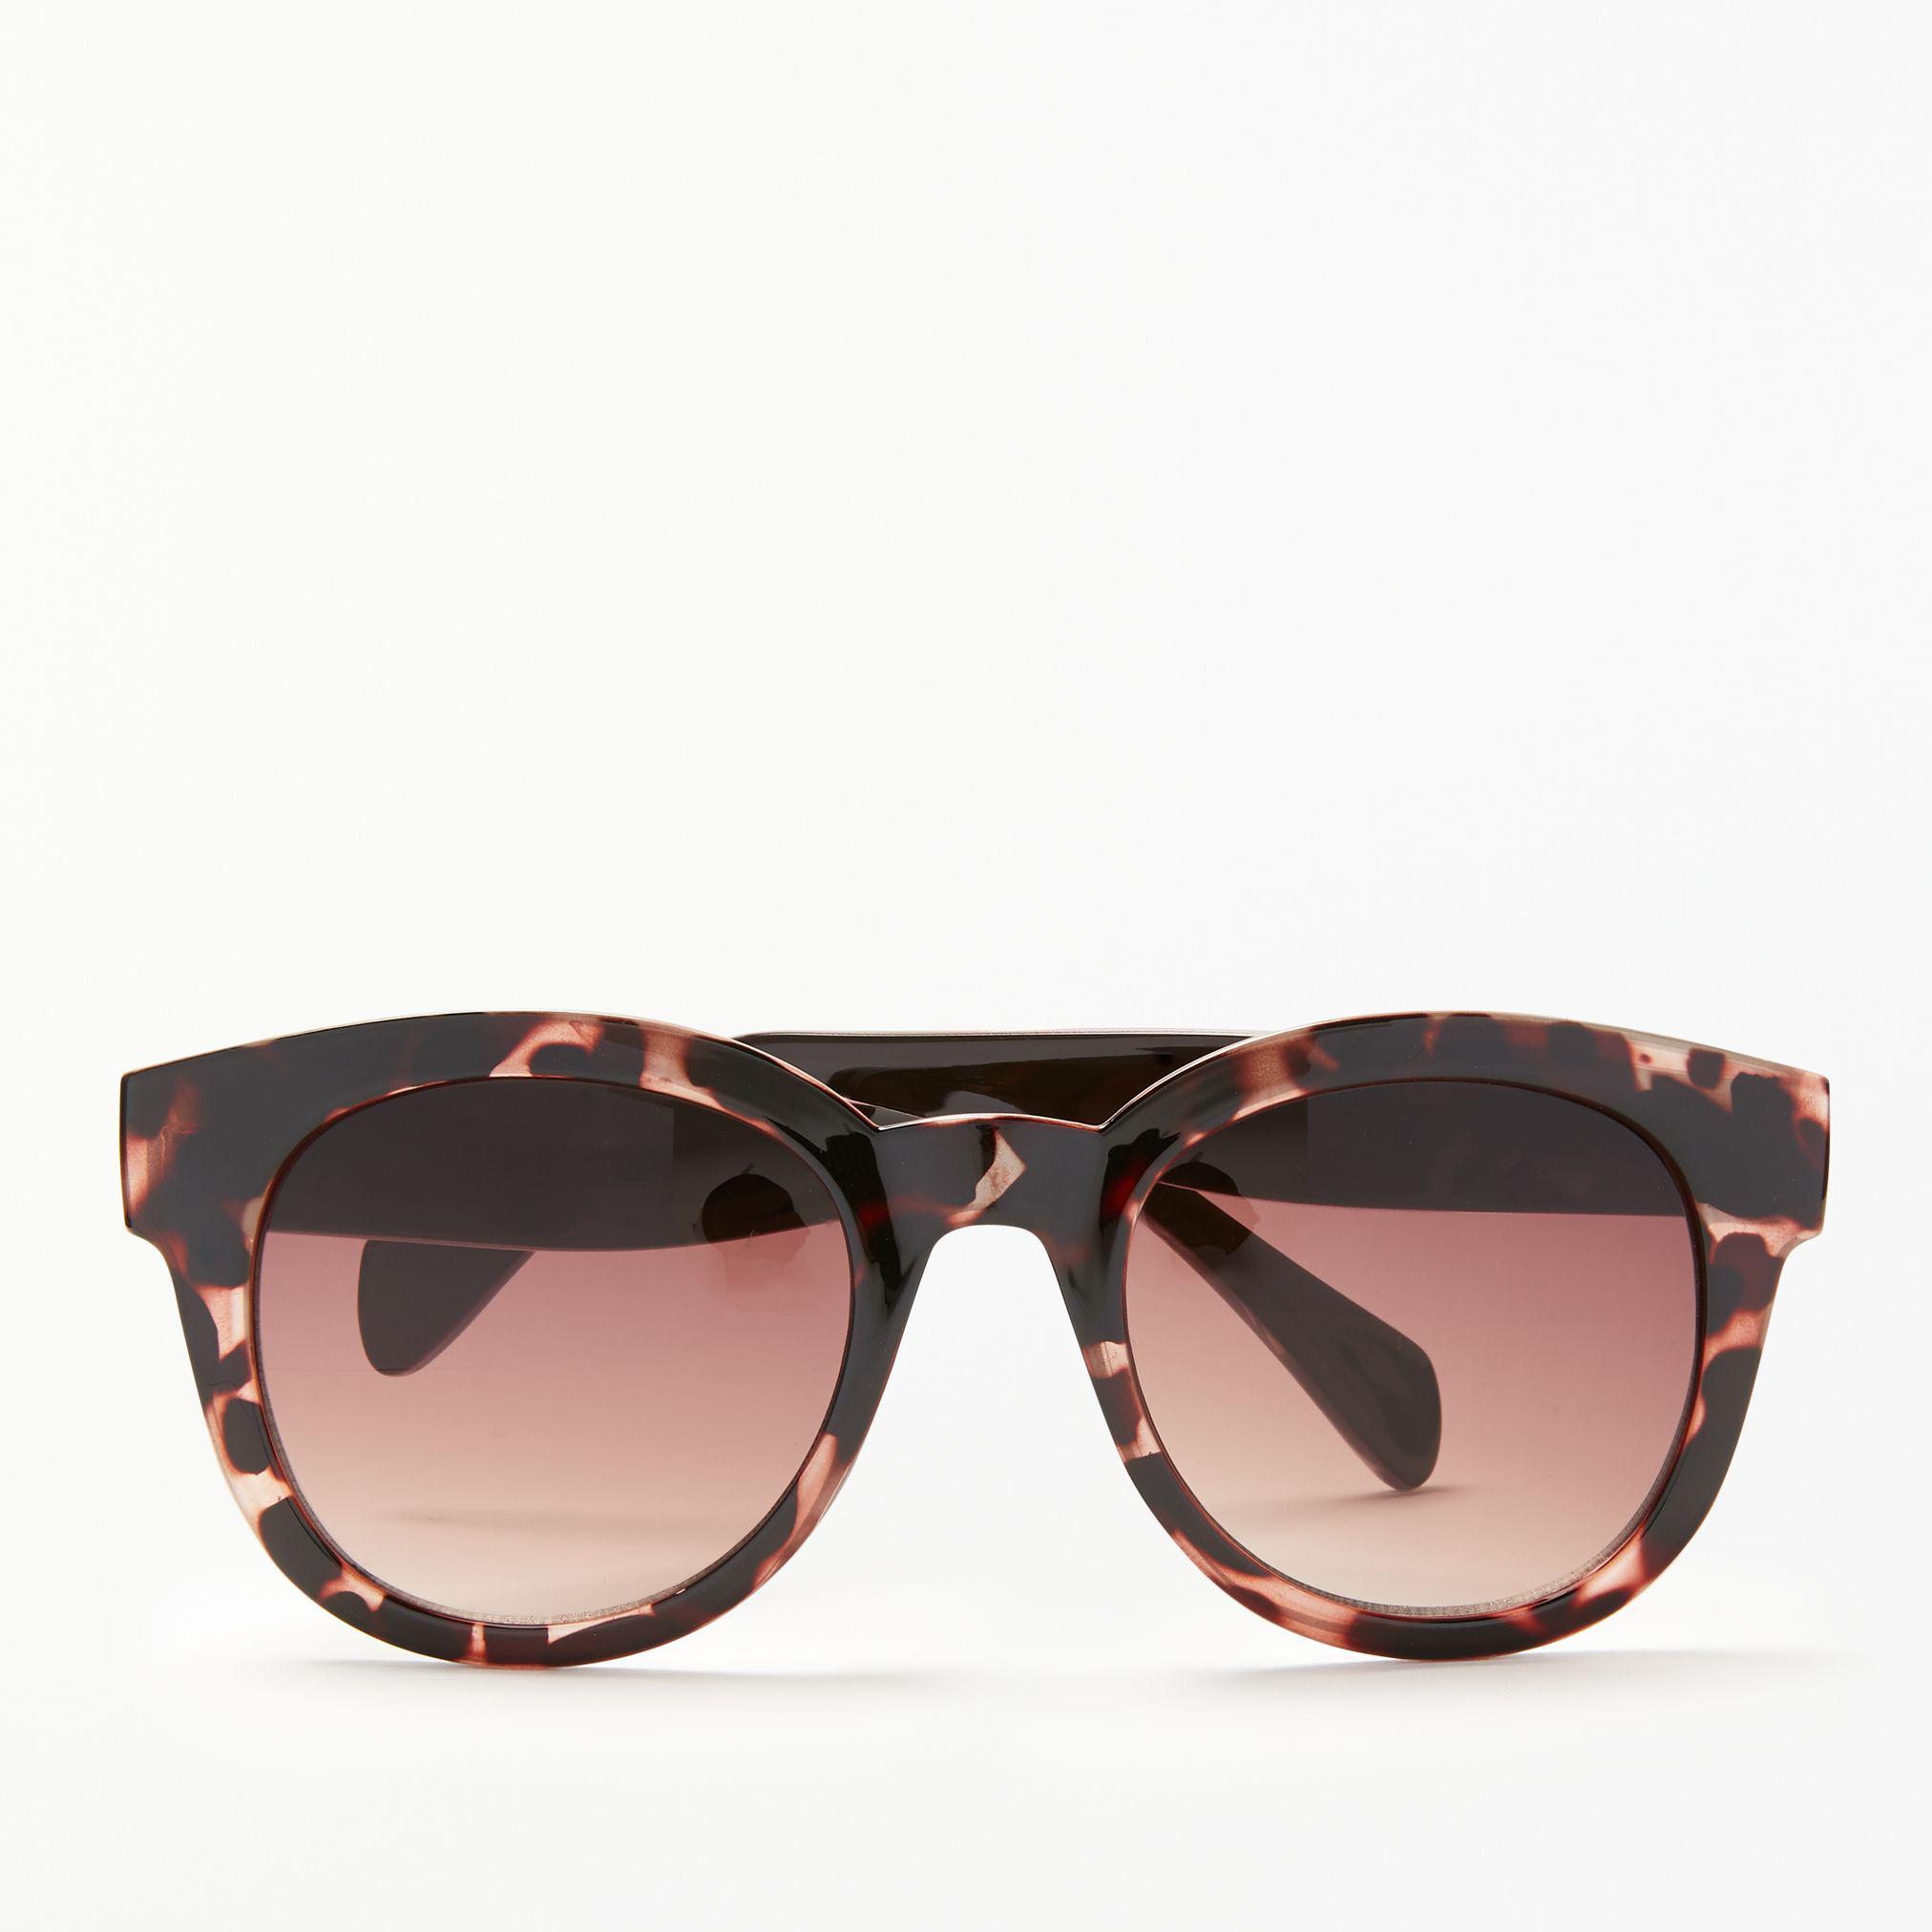 5645121502 John Lewis Milky Preppy Round Sunglasses - Lyst